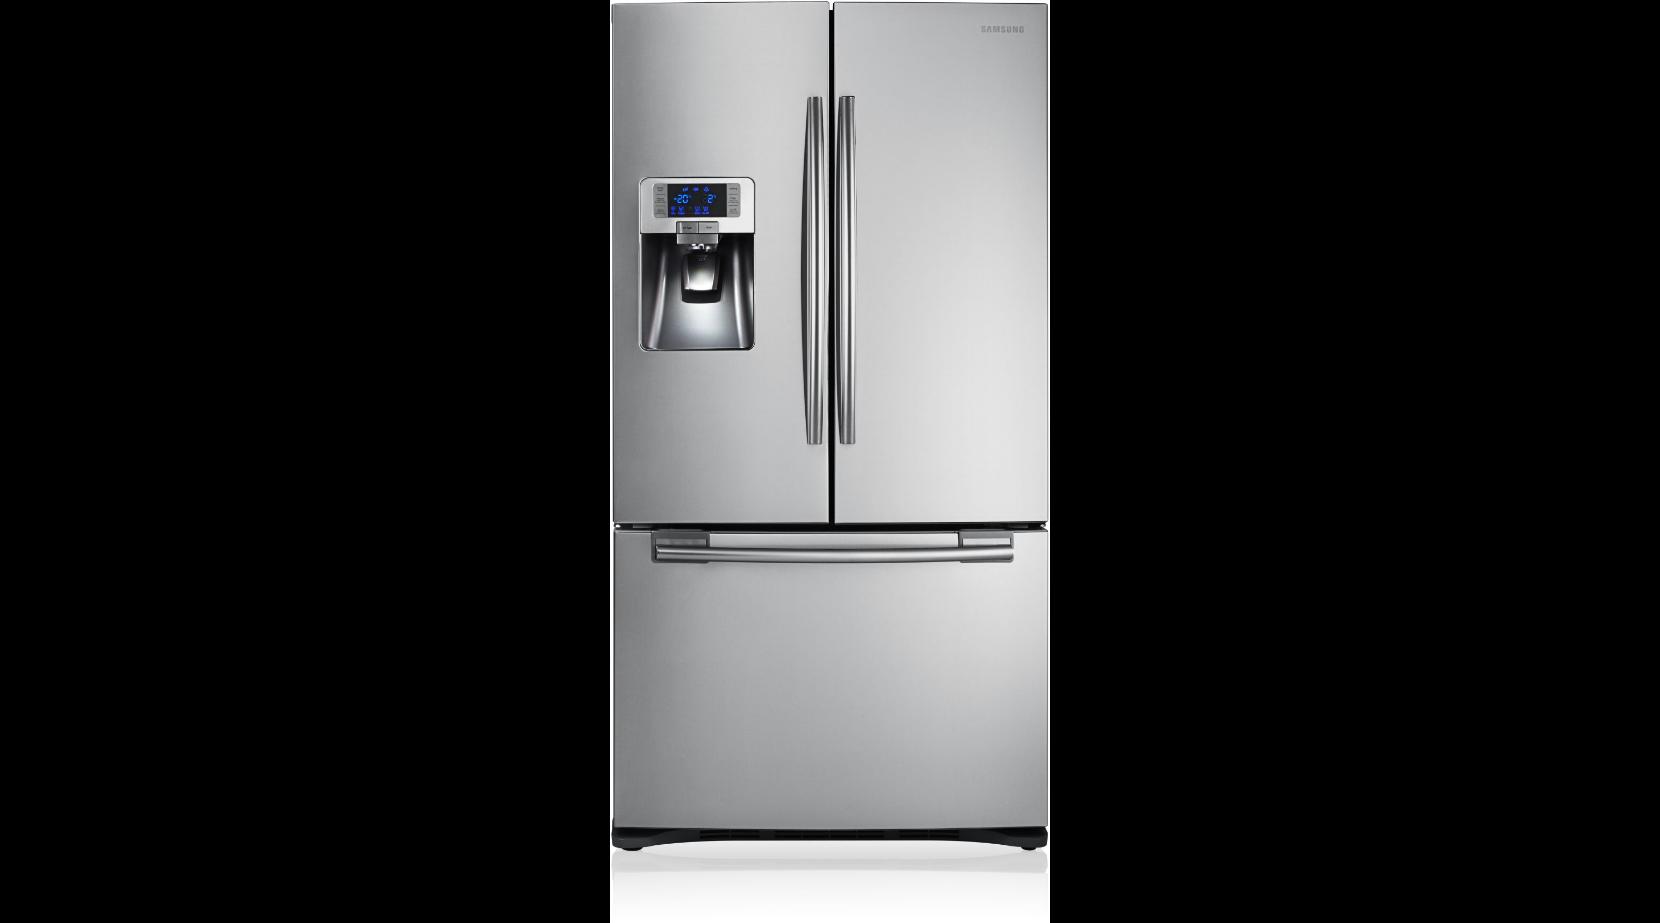 Photo Réfrigérateur Bottom Samsung RFG23RESL